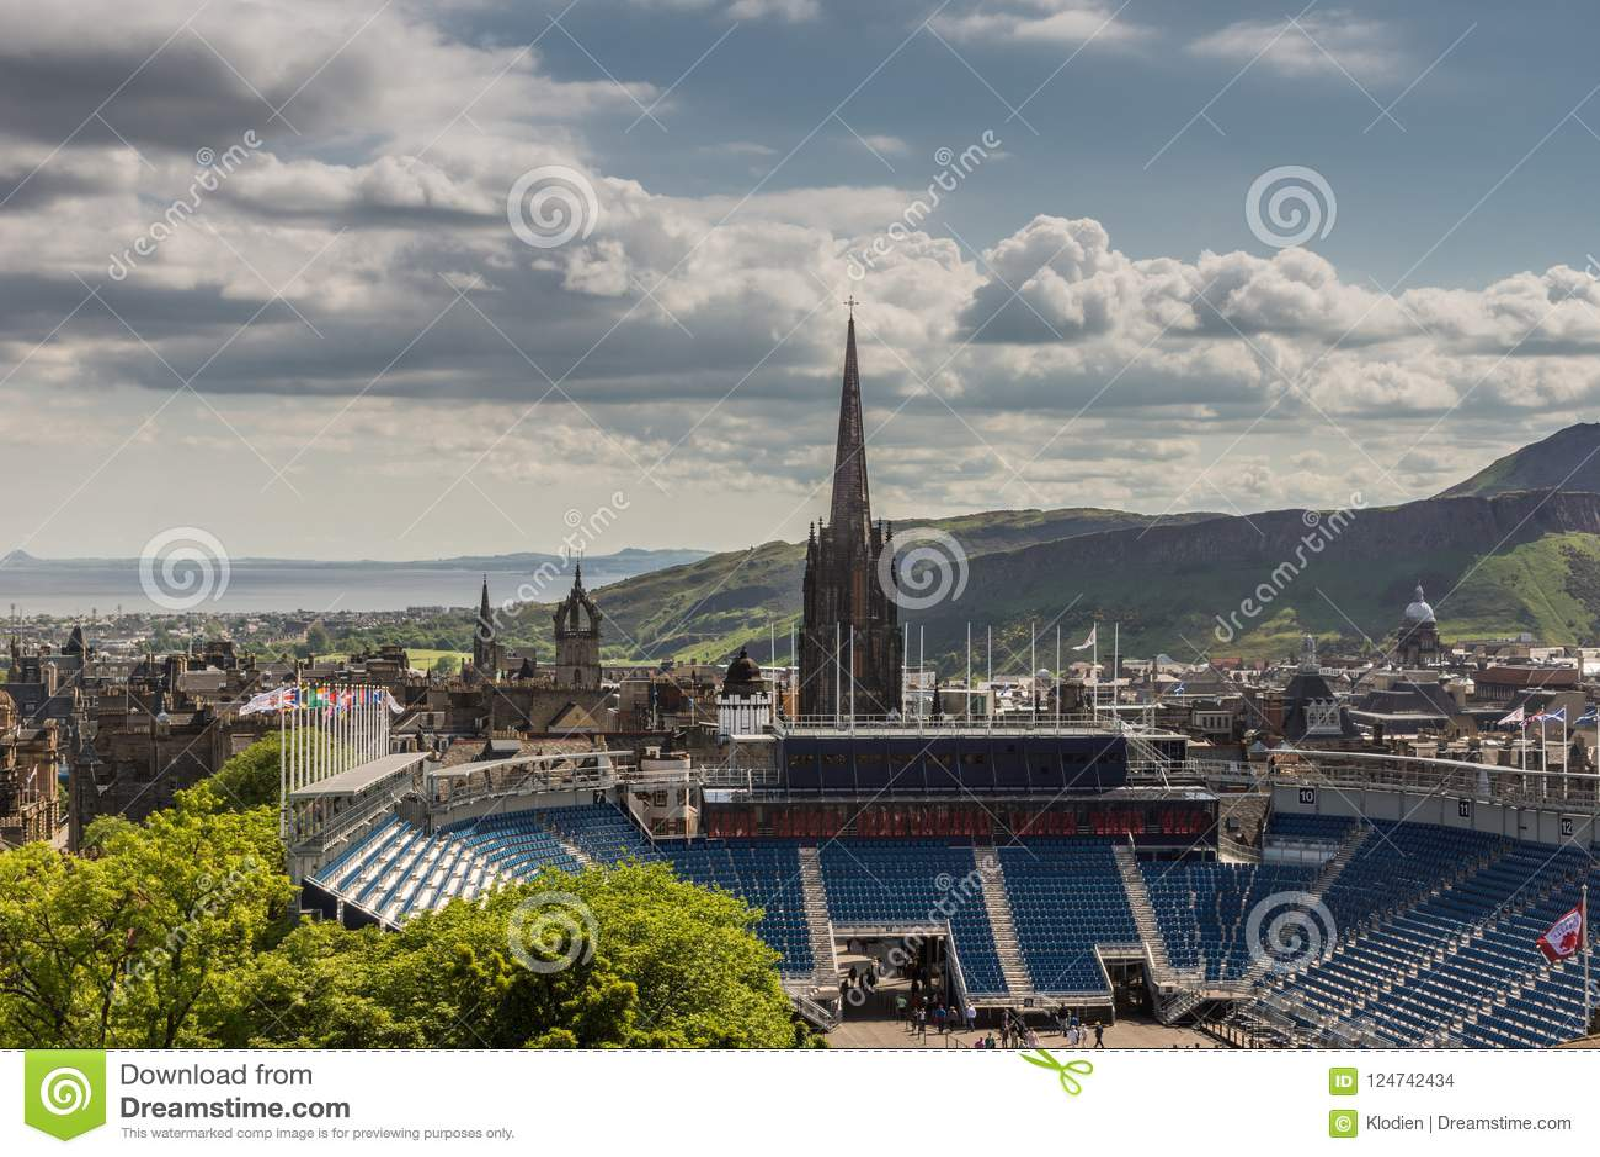 View from Castle along Royal Mile, Edinburgh, Scotland.